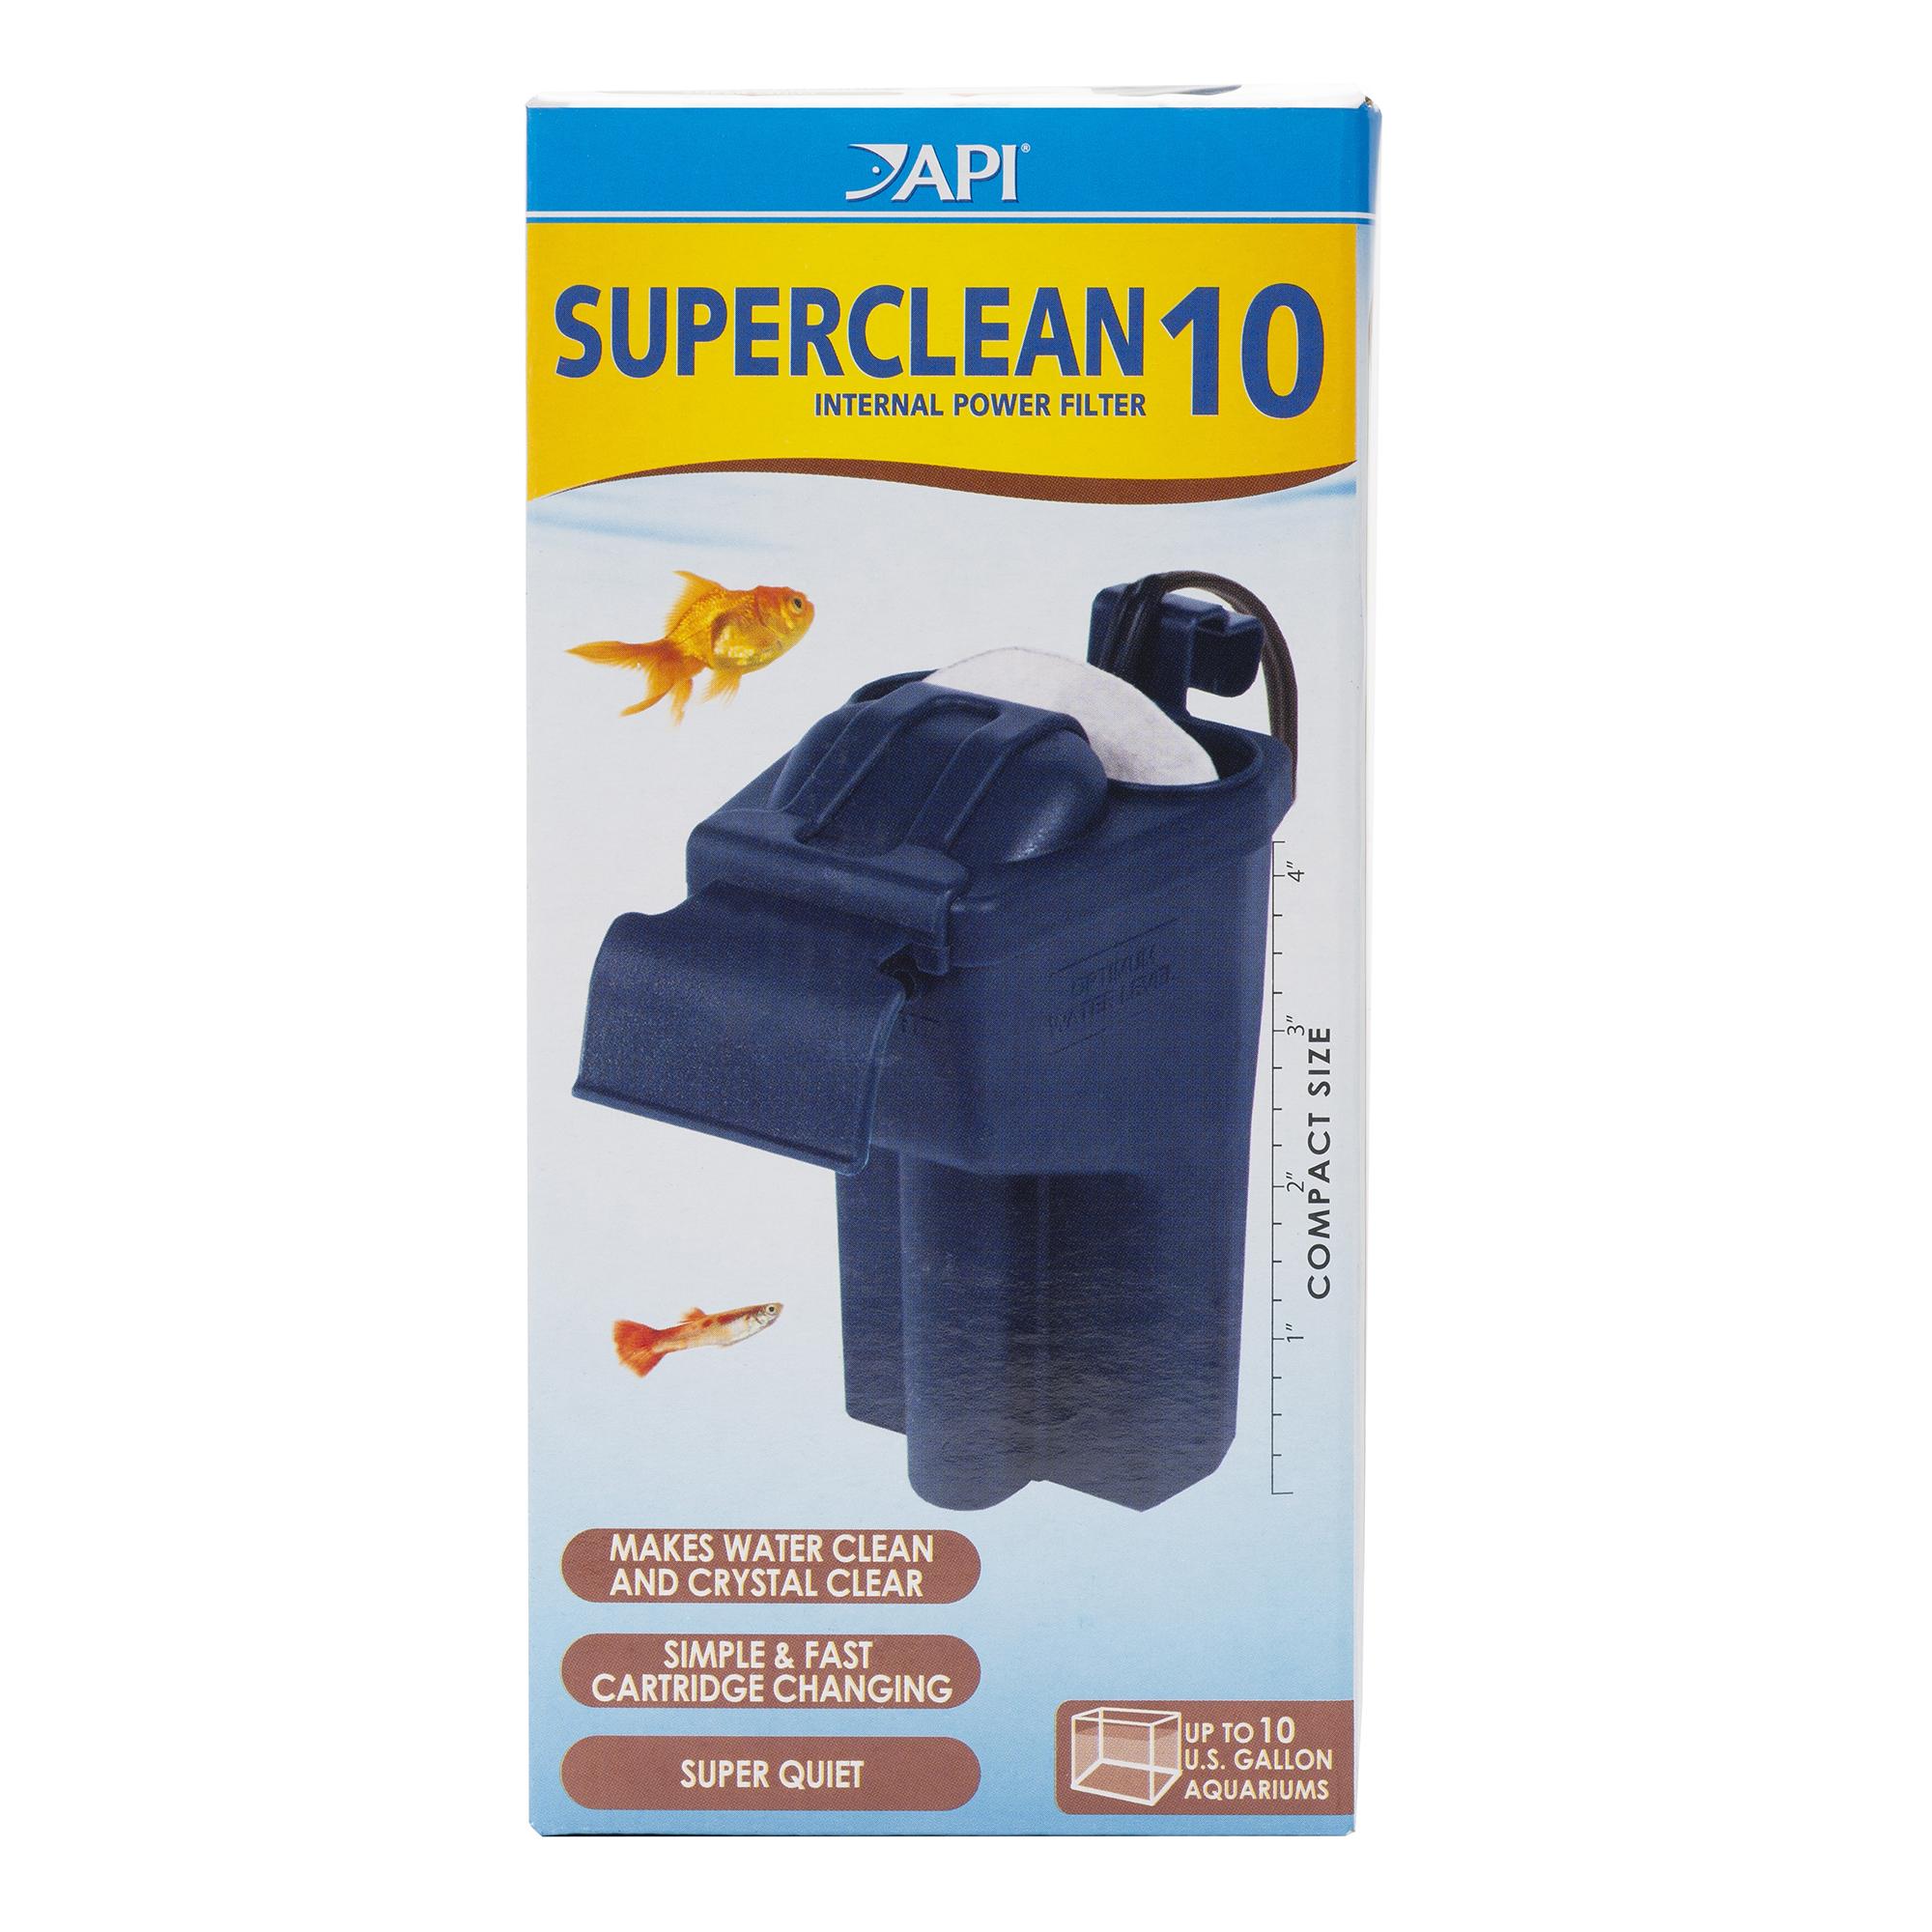 SUPERCLEAN 10 FILTER